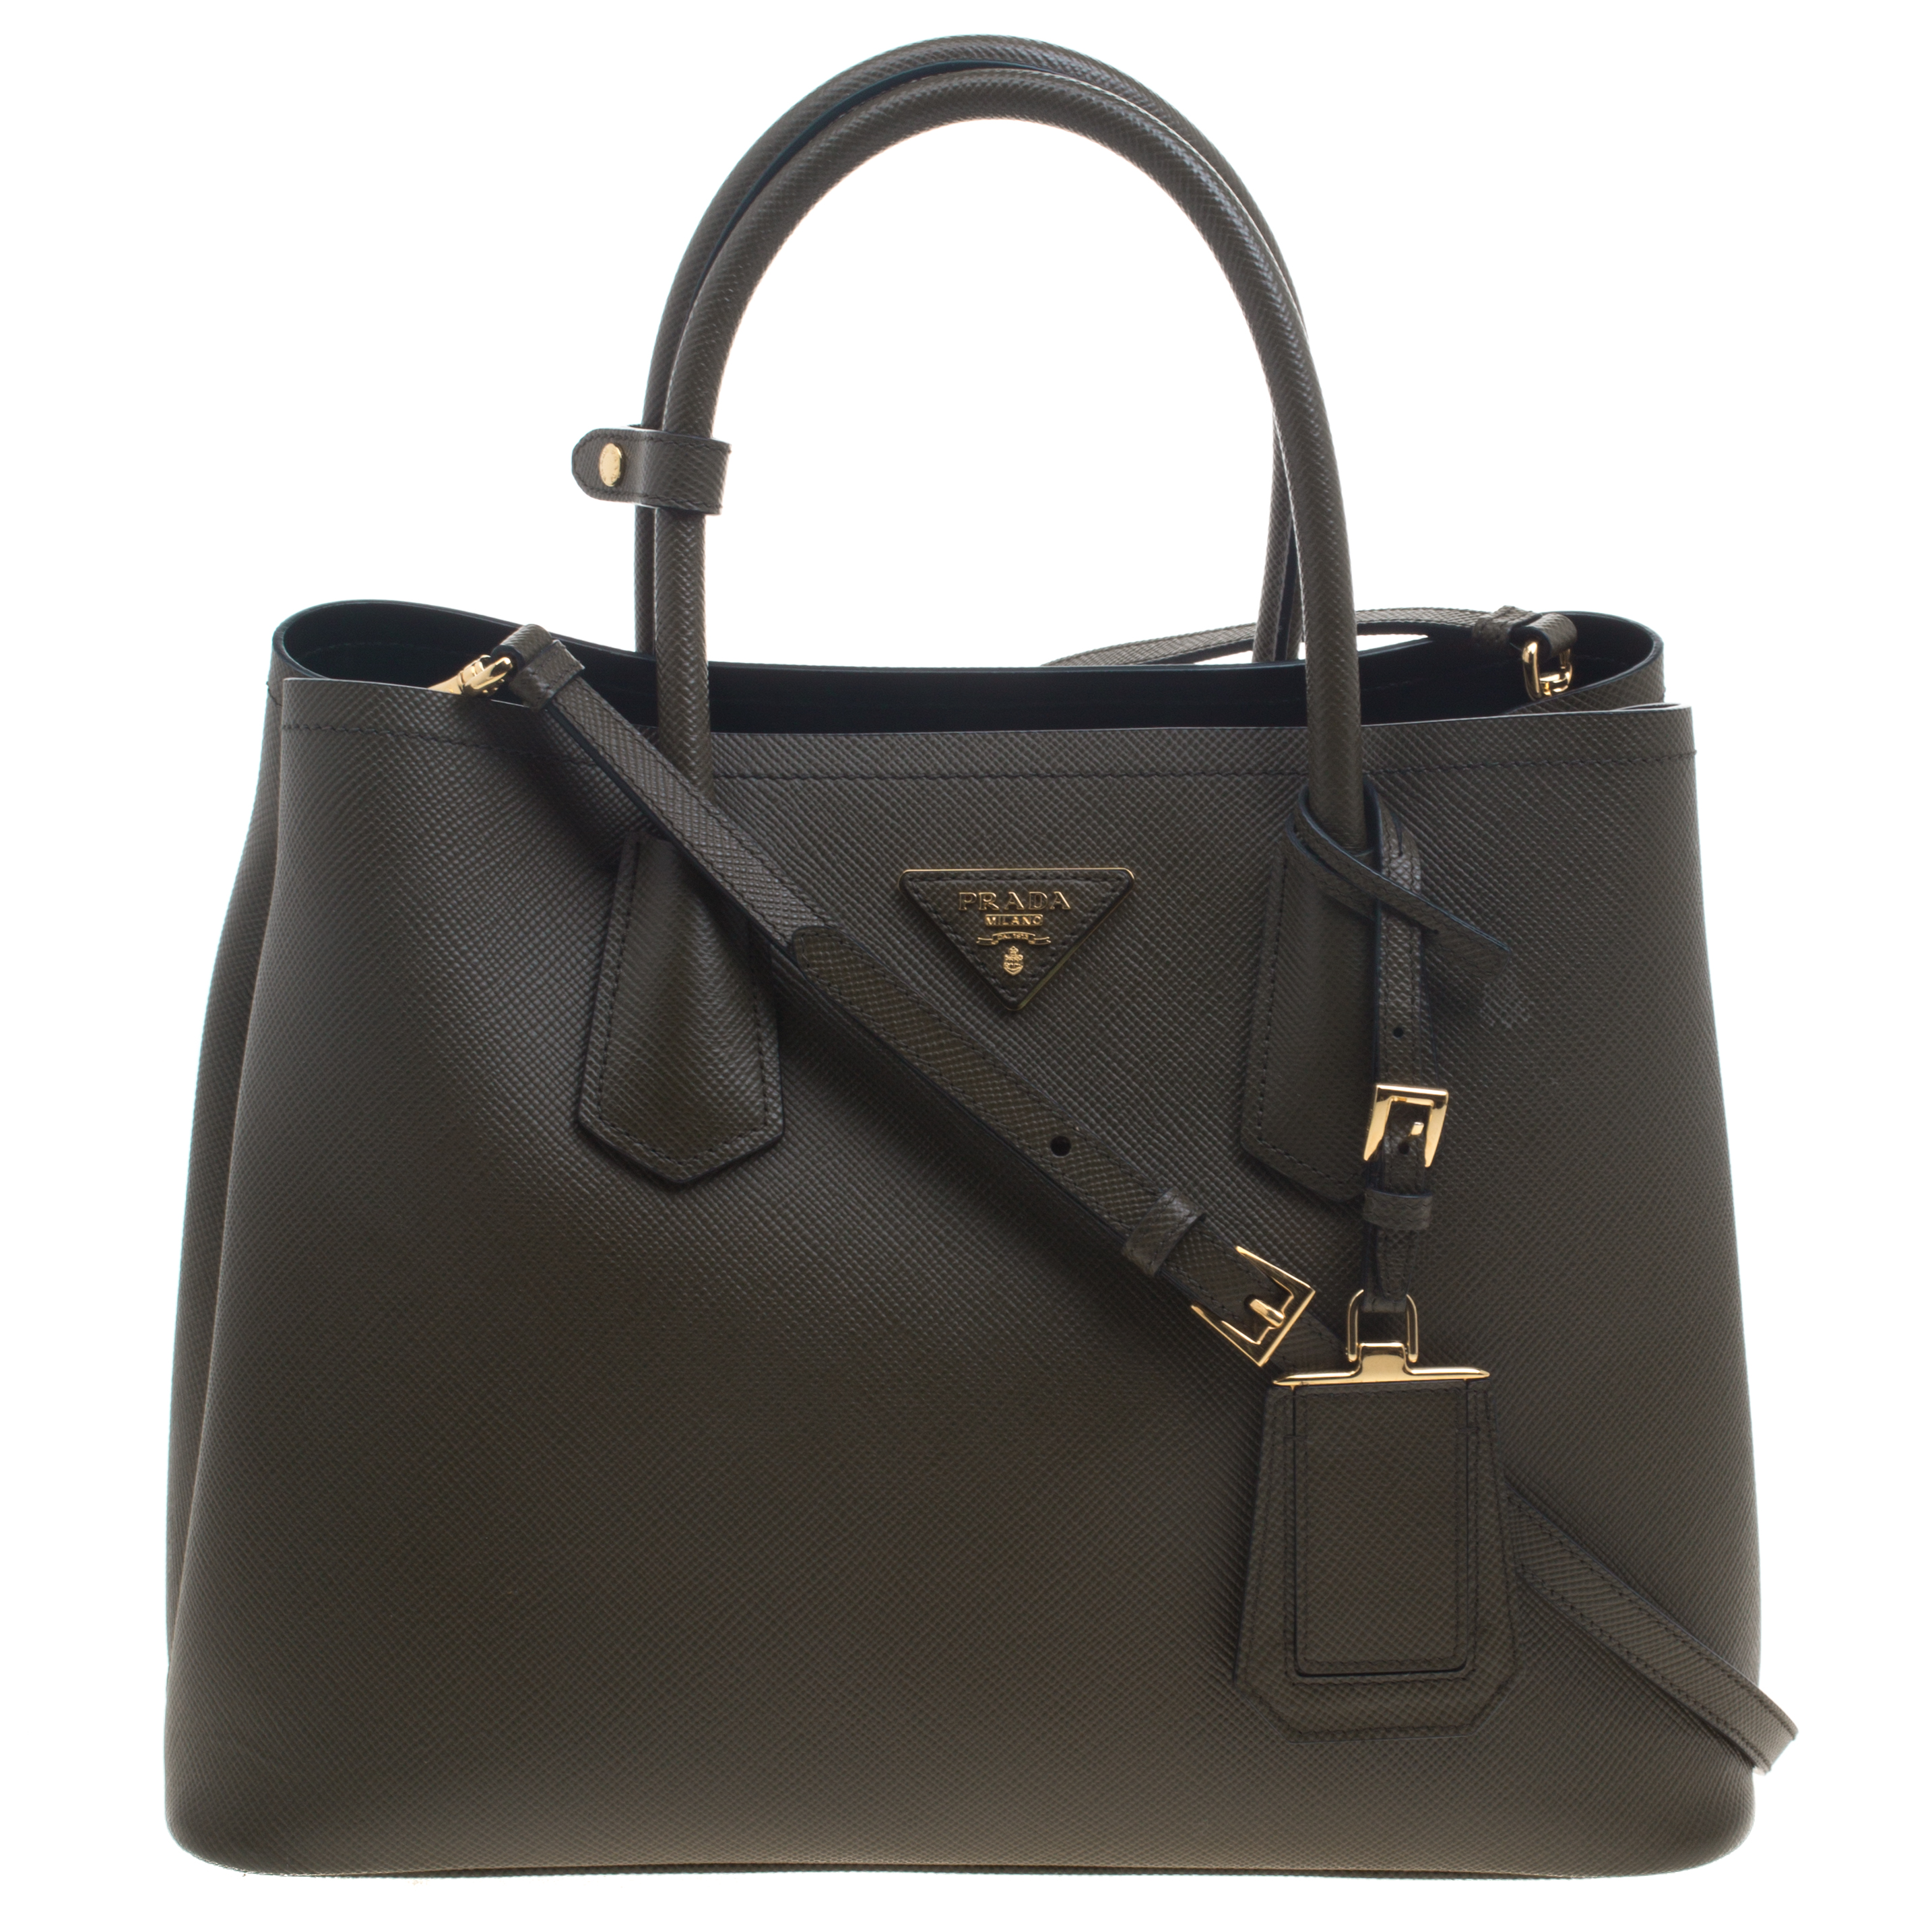 acf3464f3907 ... Prada Olive Green Saffiano Cuir Leather Convertible Tote. nextprev.  prevnext